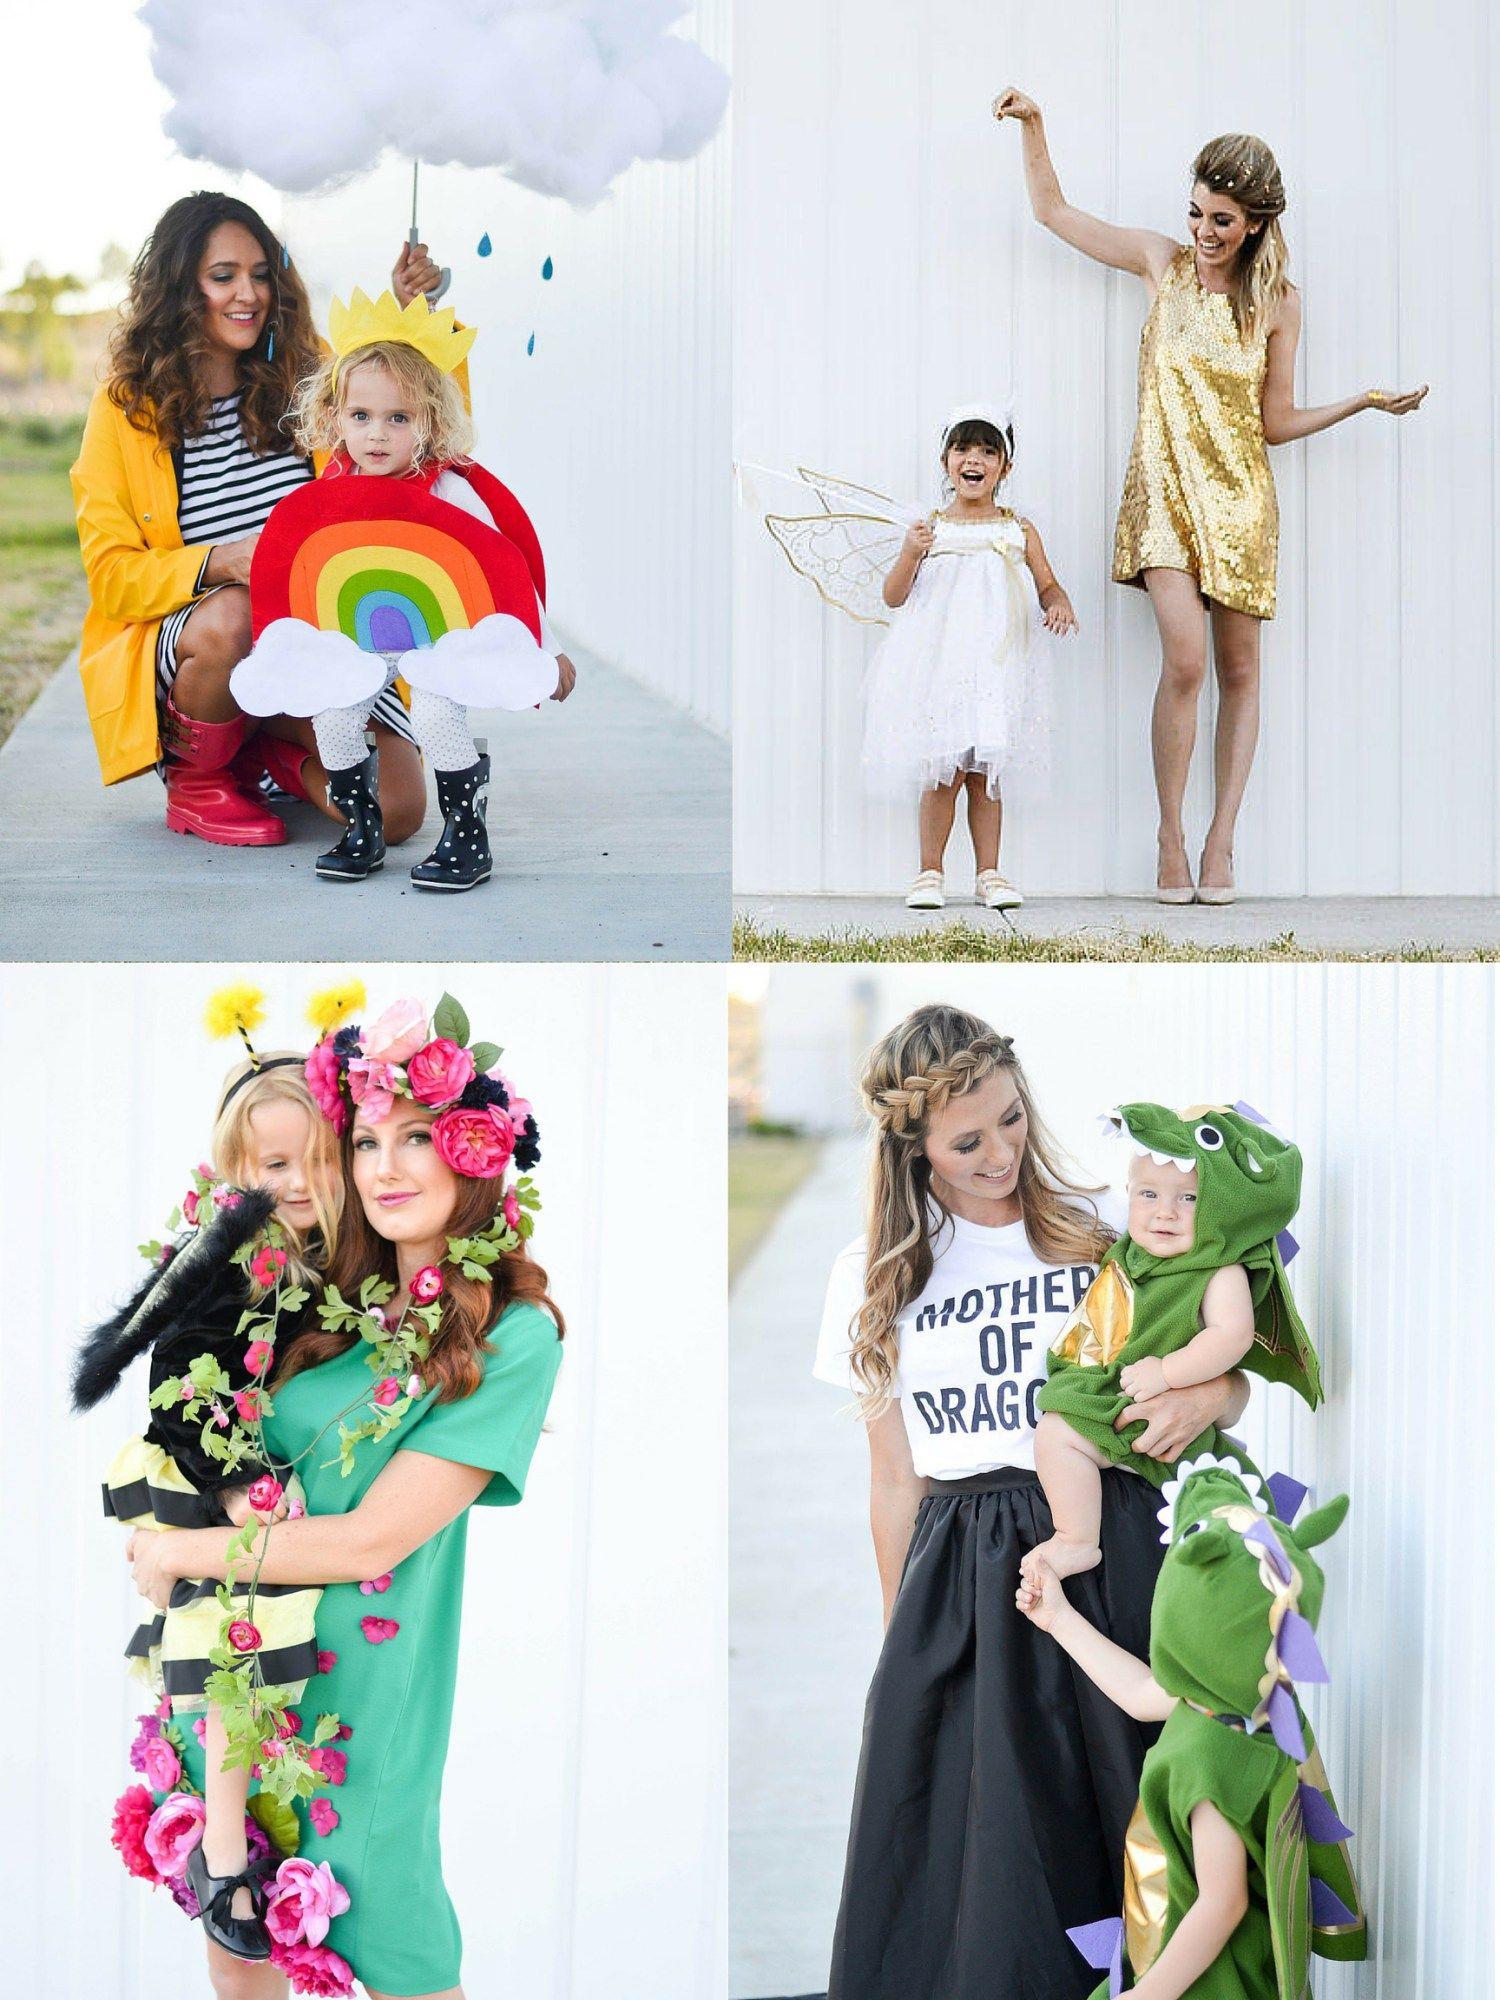 Creative Mom and Kid Halloween Costumes | Pinterest | Halloween ...